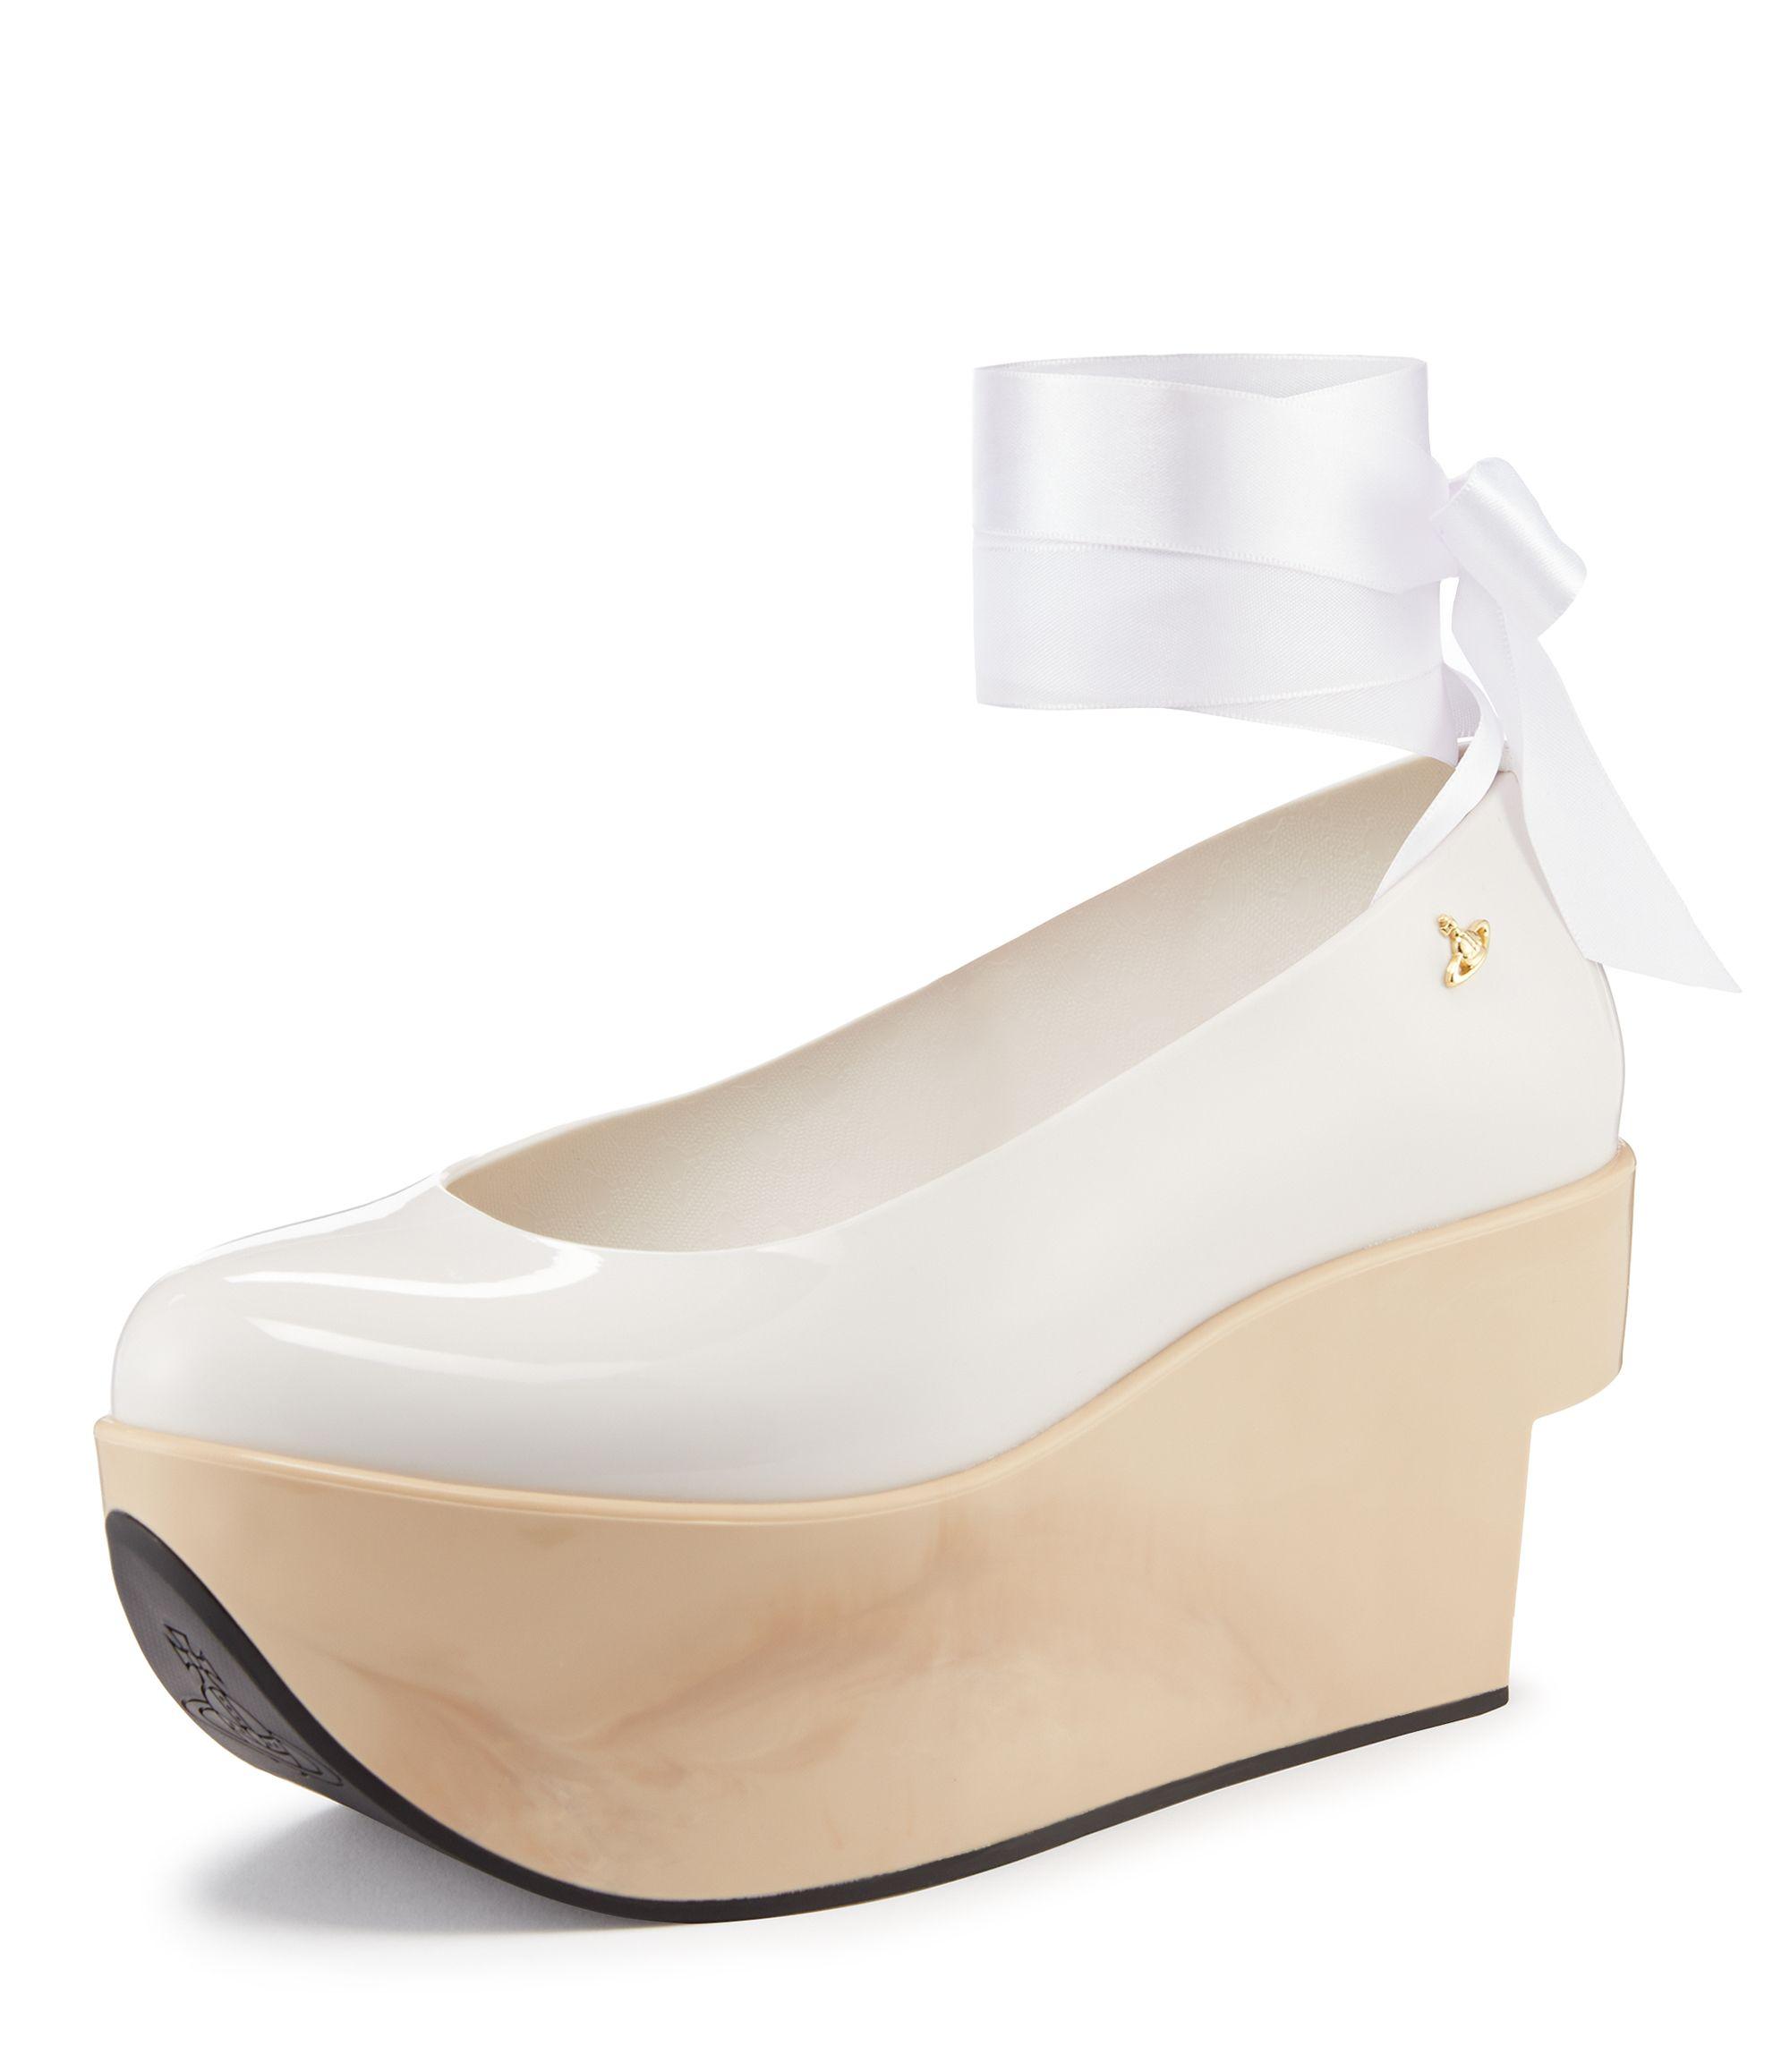 ac3decded179 VIVIENNE WESTWOOD White Rocking Horse Ballerina.  viviennewestwood  shoes